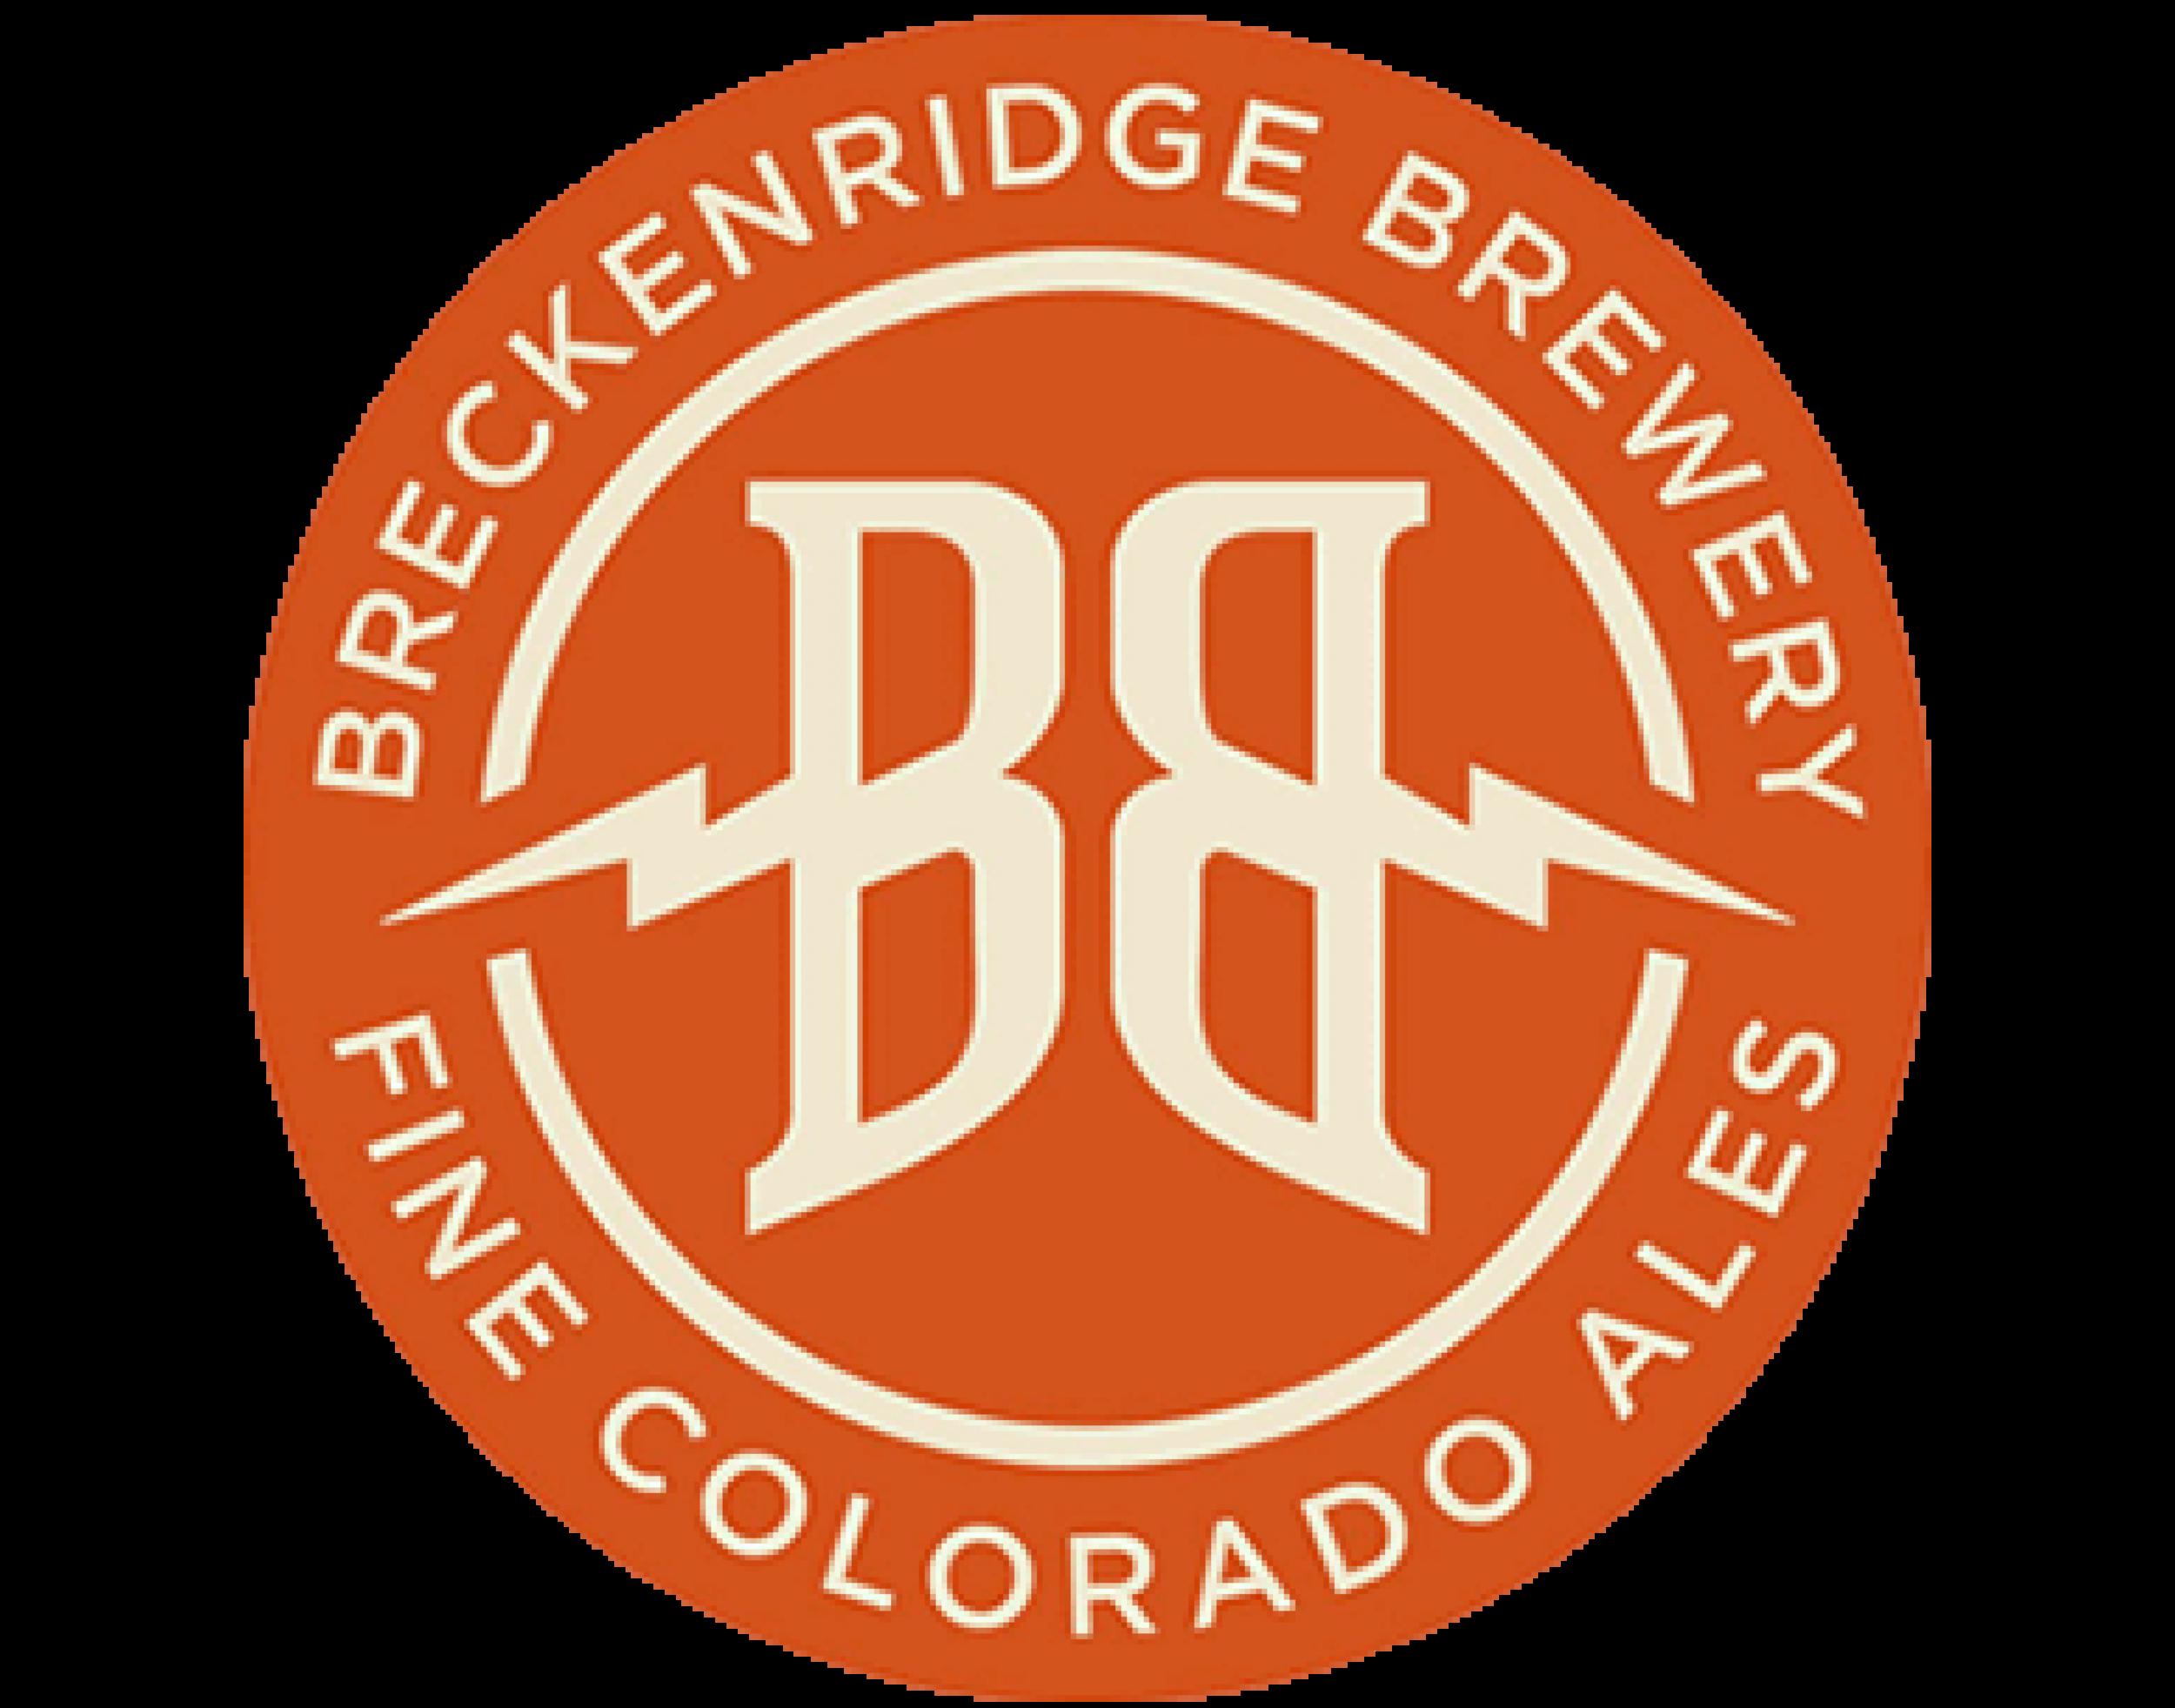 Breckenridge Brewery logo. Links to Breckenridge Brewery website.